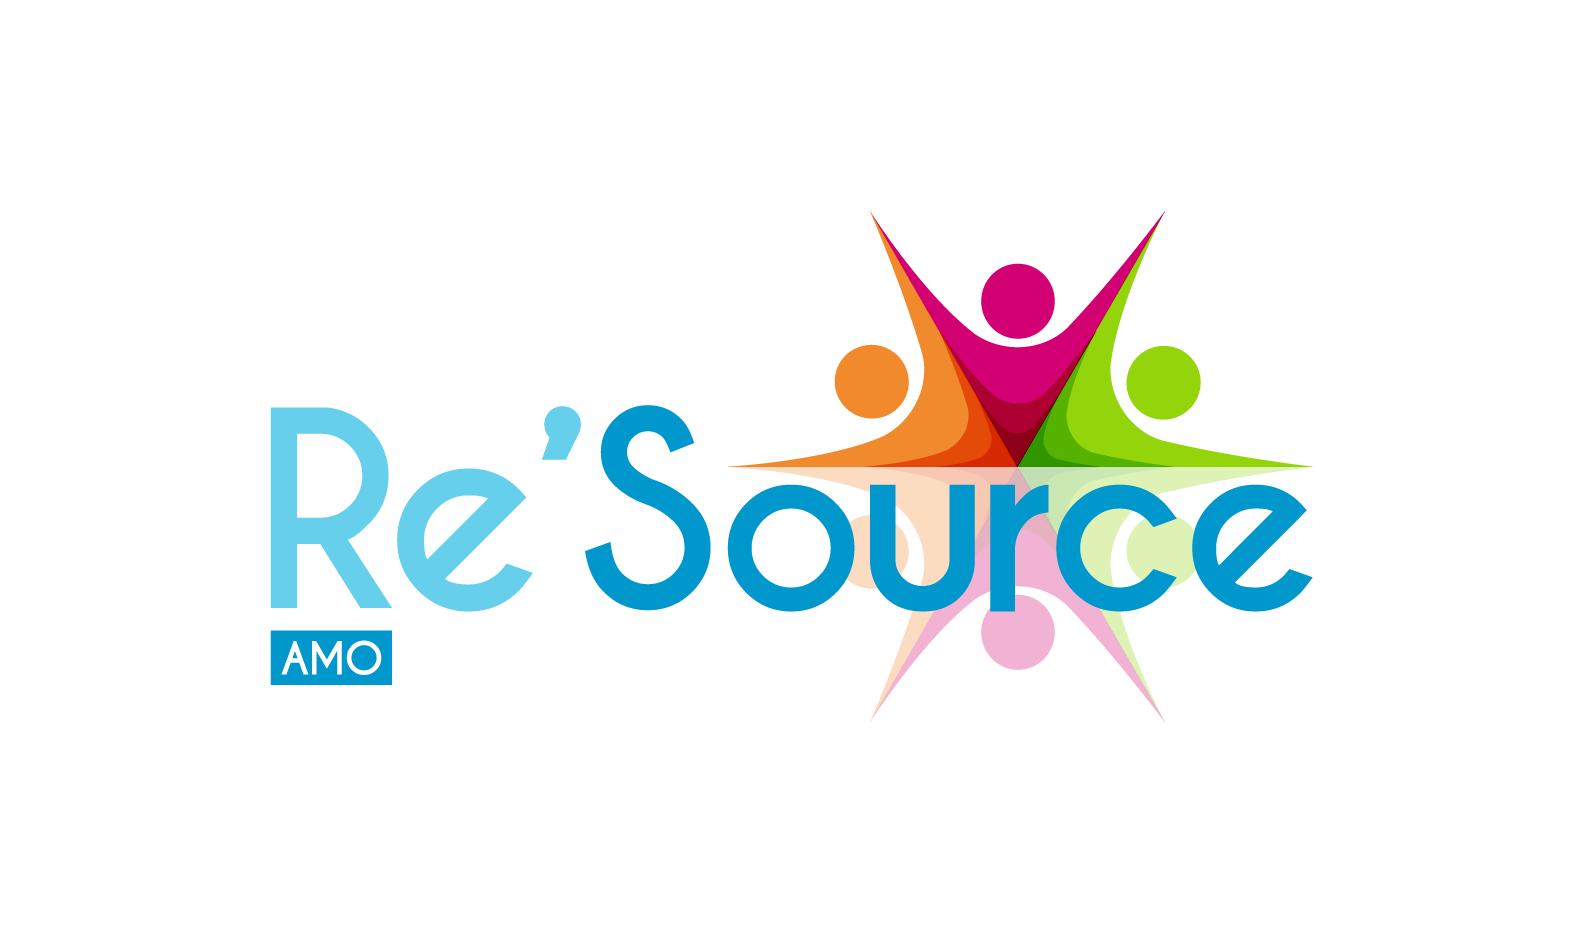 Logo AMO Re'Source